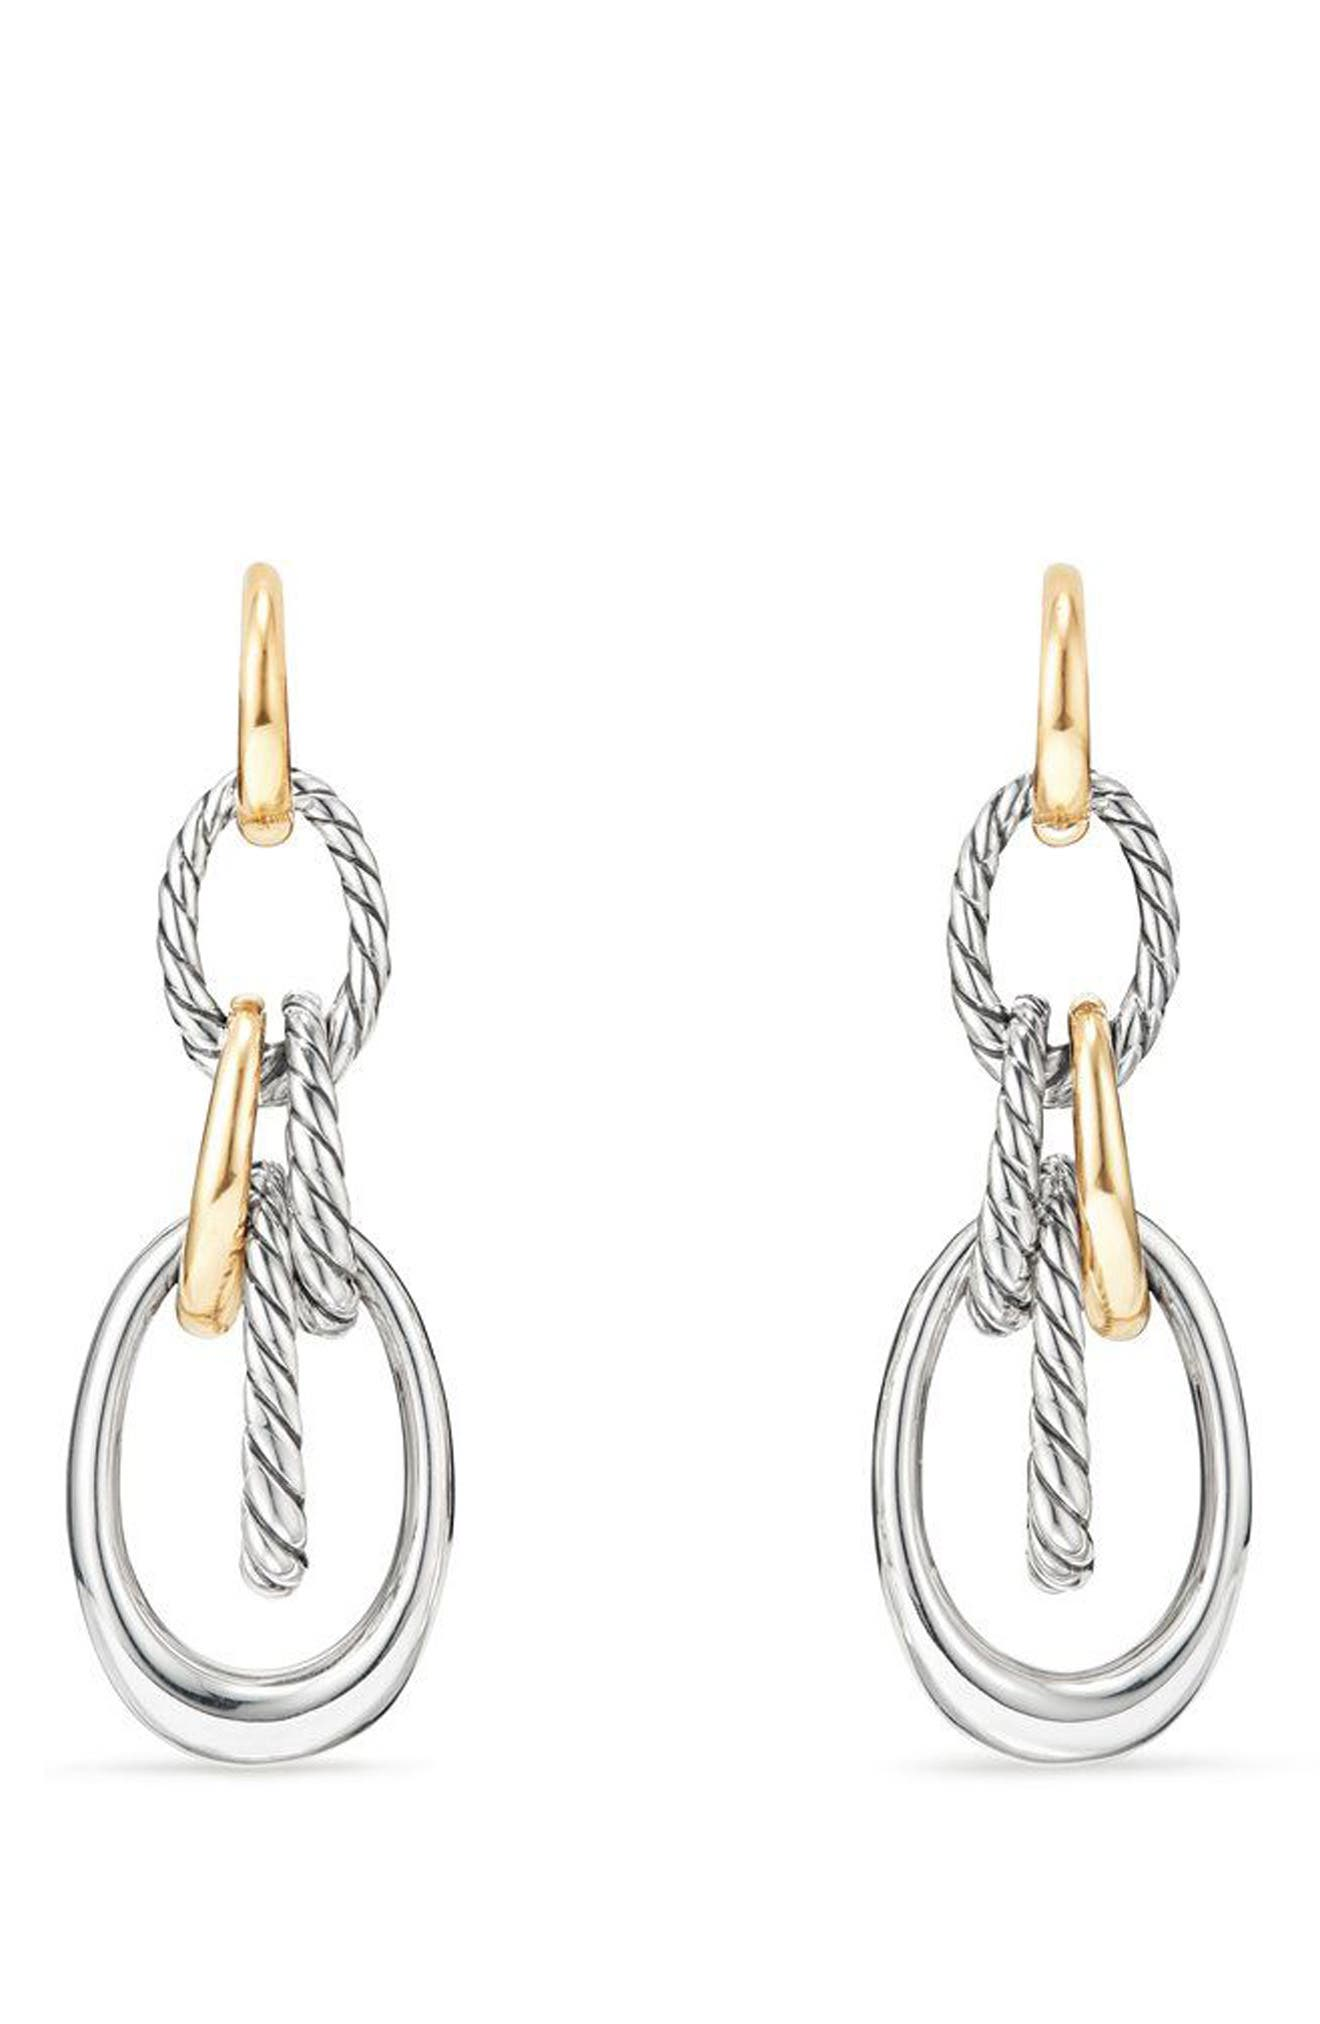 Main Image - David Yurman Pure Form® Drop Earrings